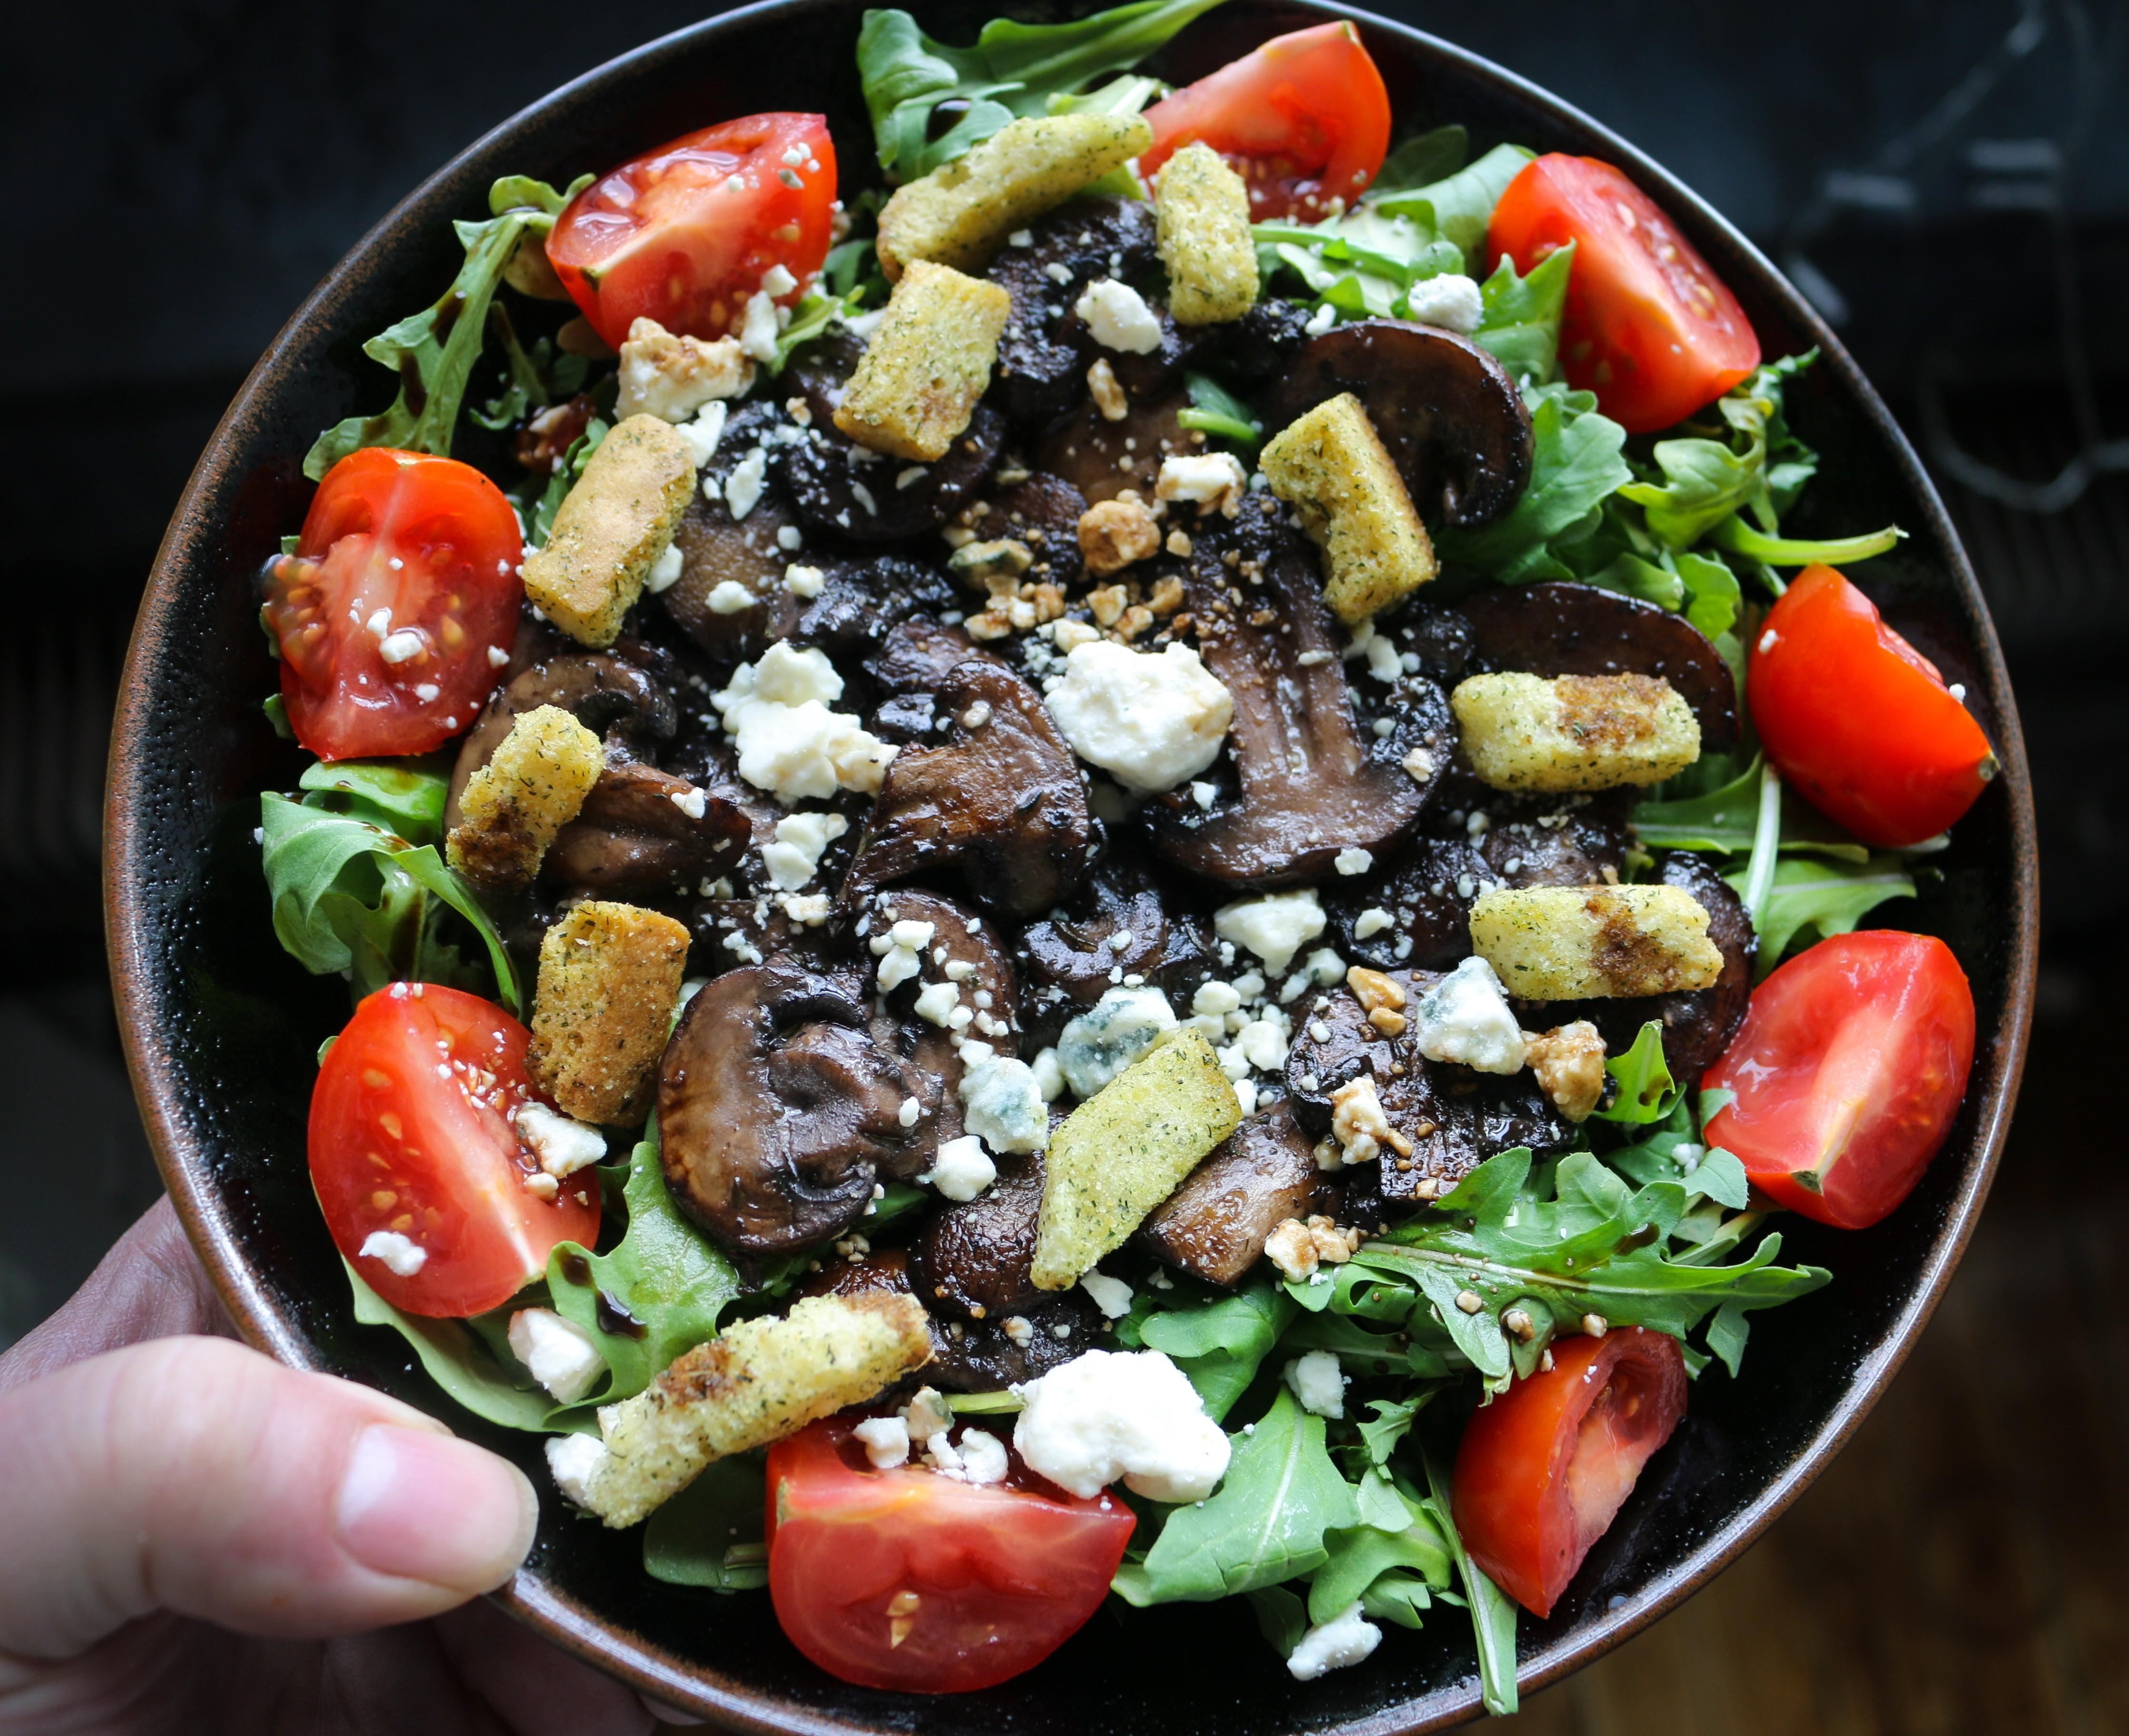 Seared Mushroom Salad with Blue Cheese and Arugula